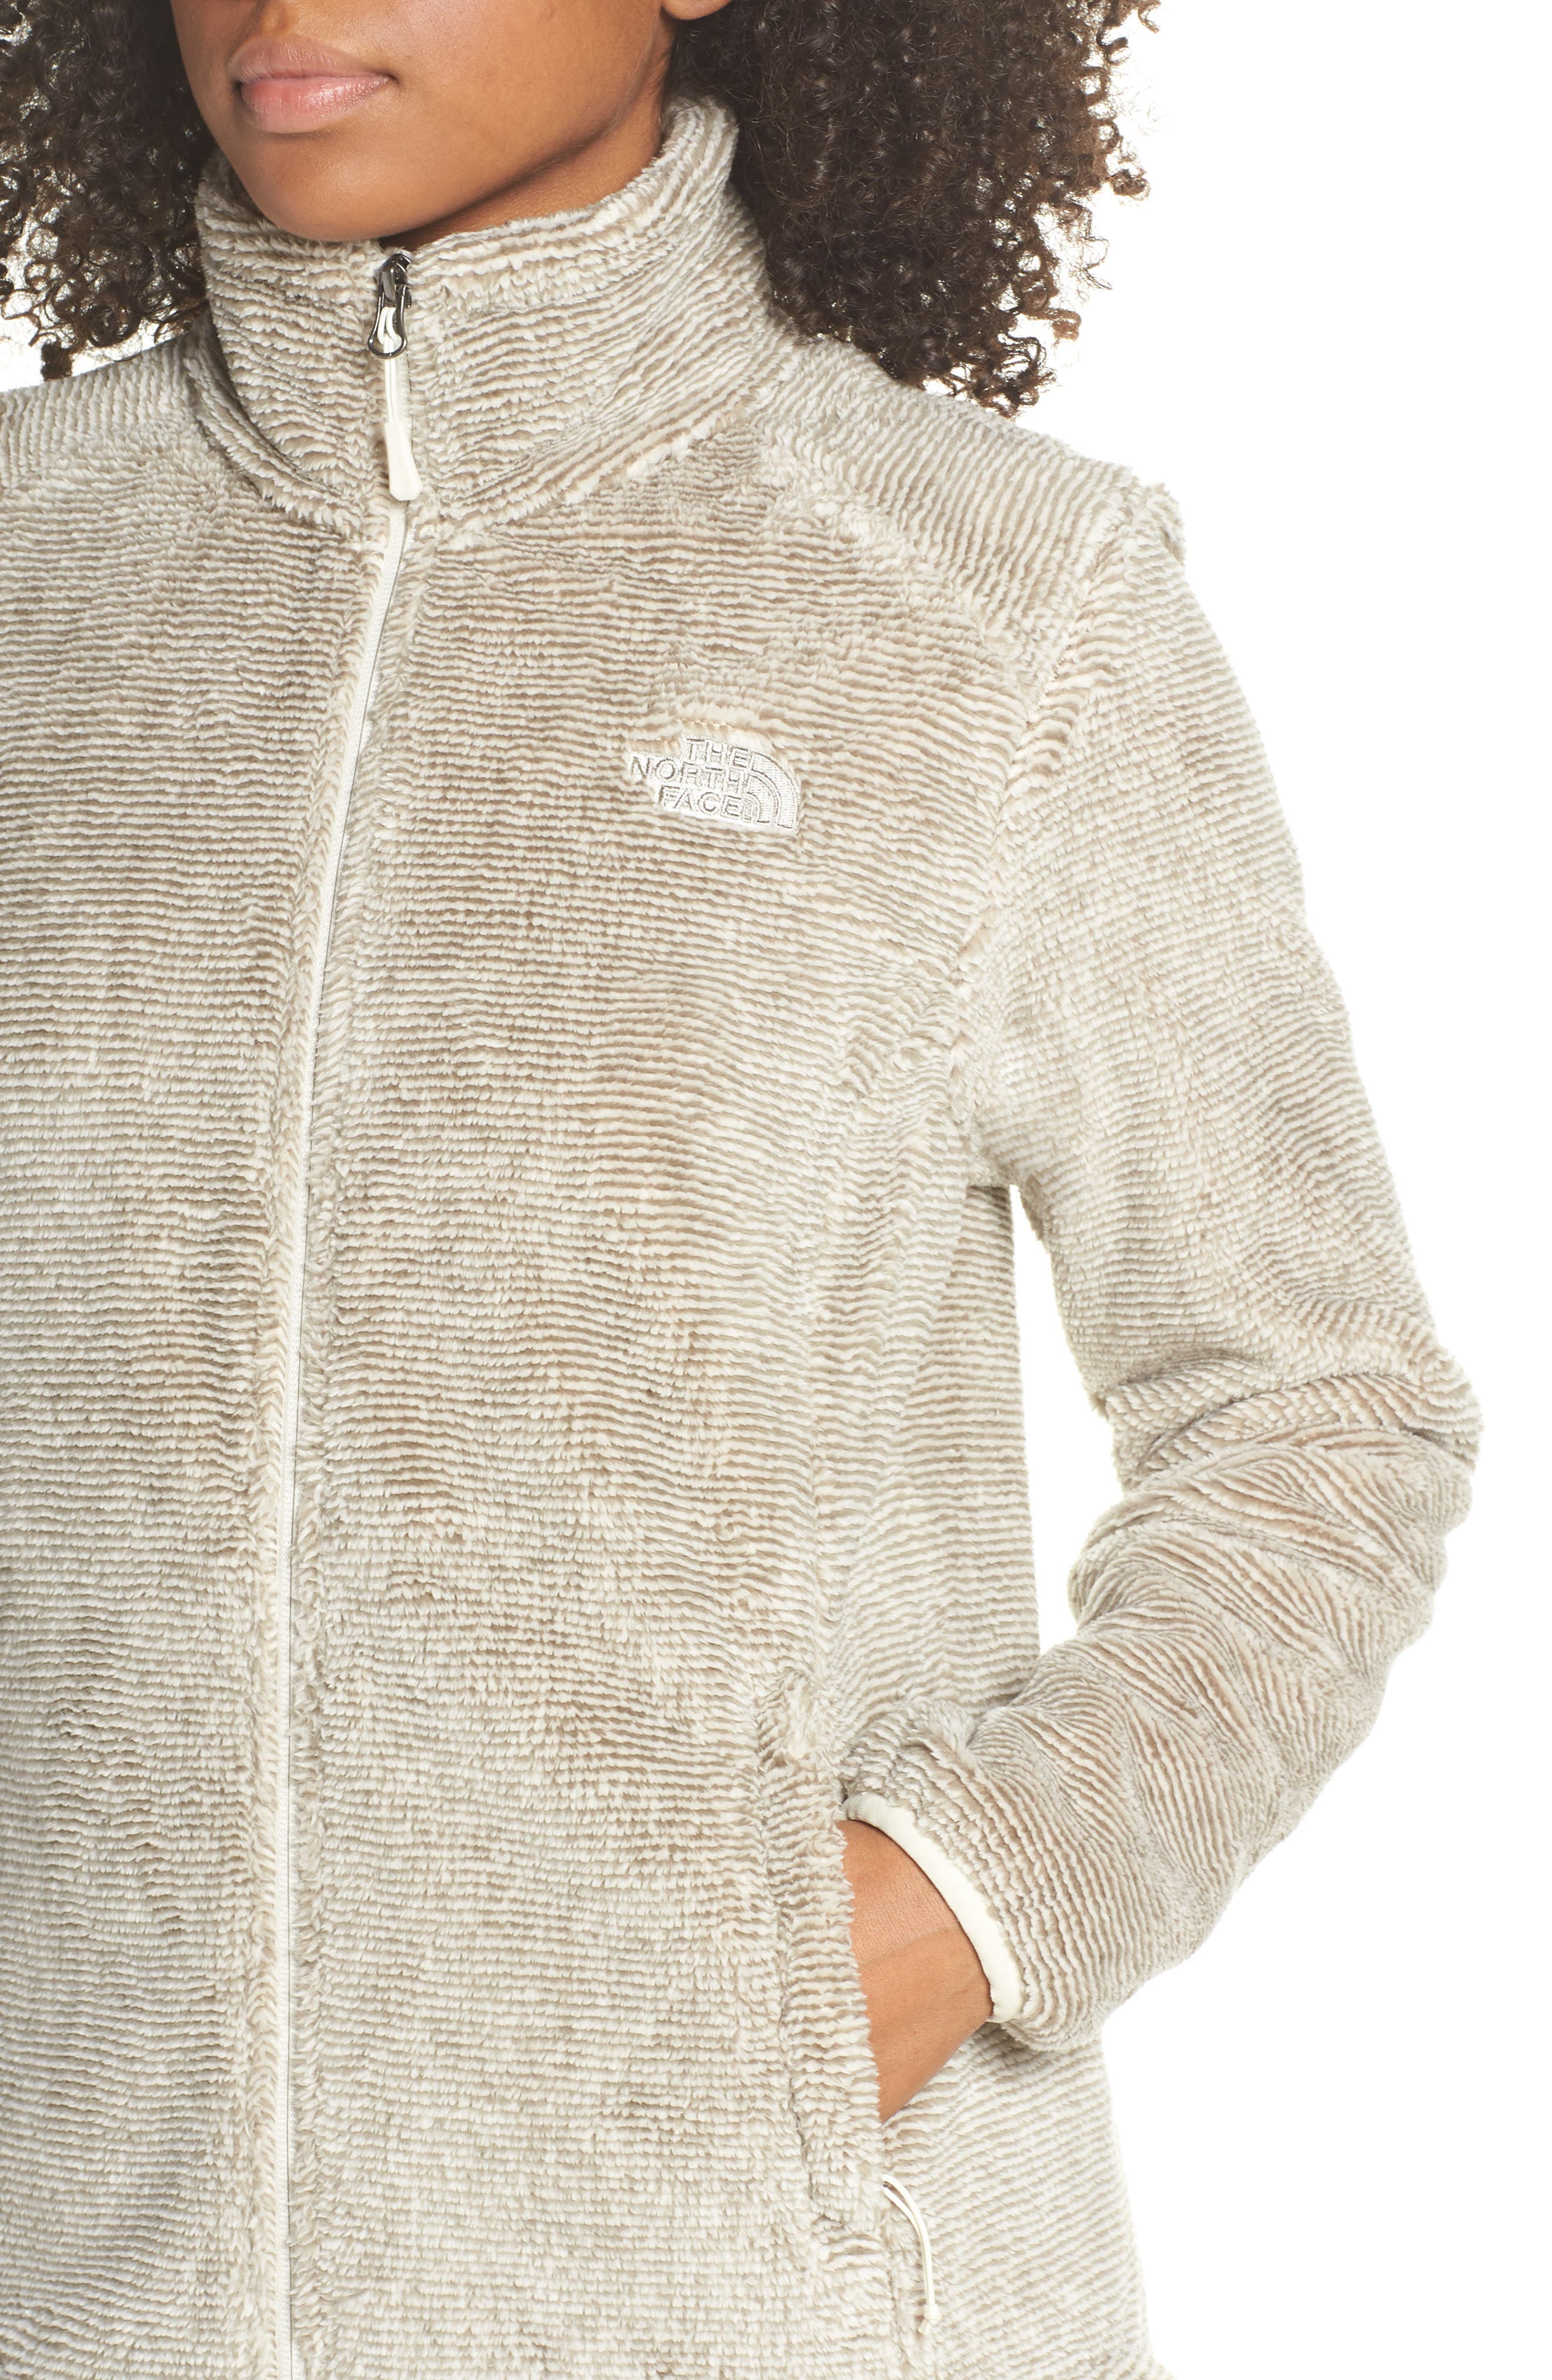 THE NORTH FACE, Osito 2 Stripe Fleece Jacket, Alternate thumbnail 5, color, GREY/ VINTAGE WHITE STRIPE